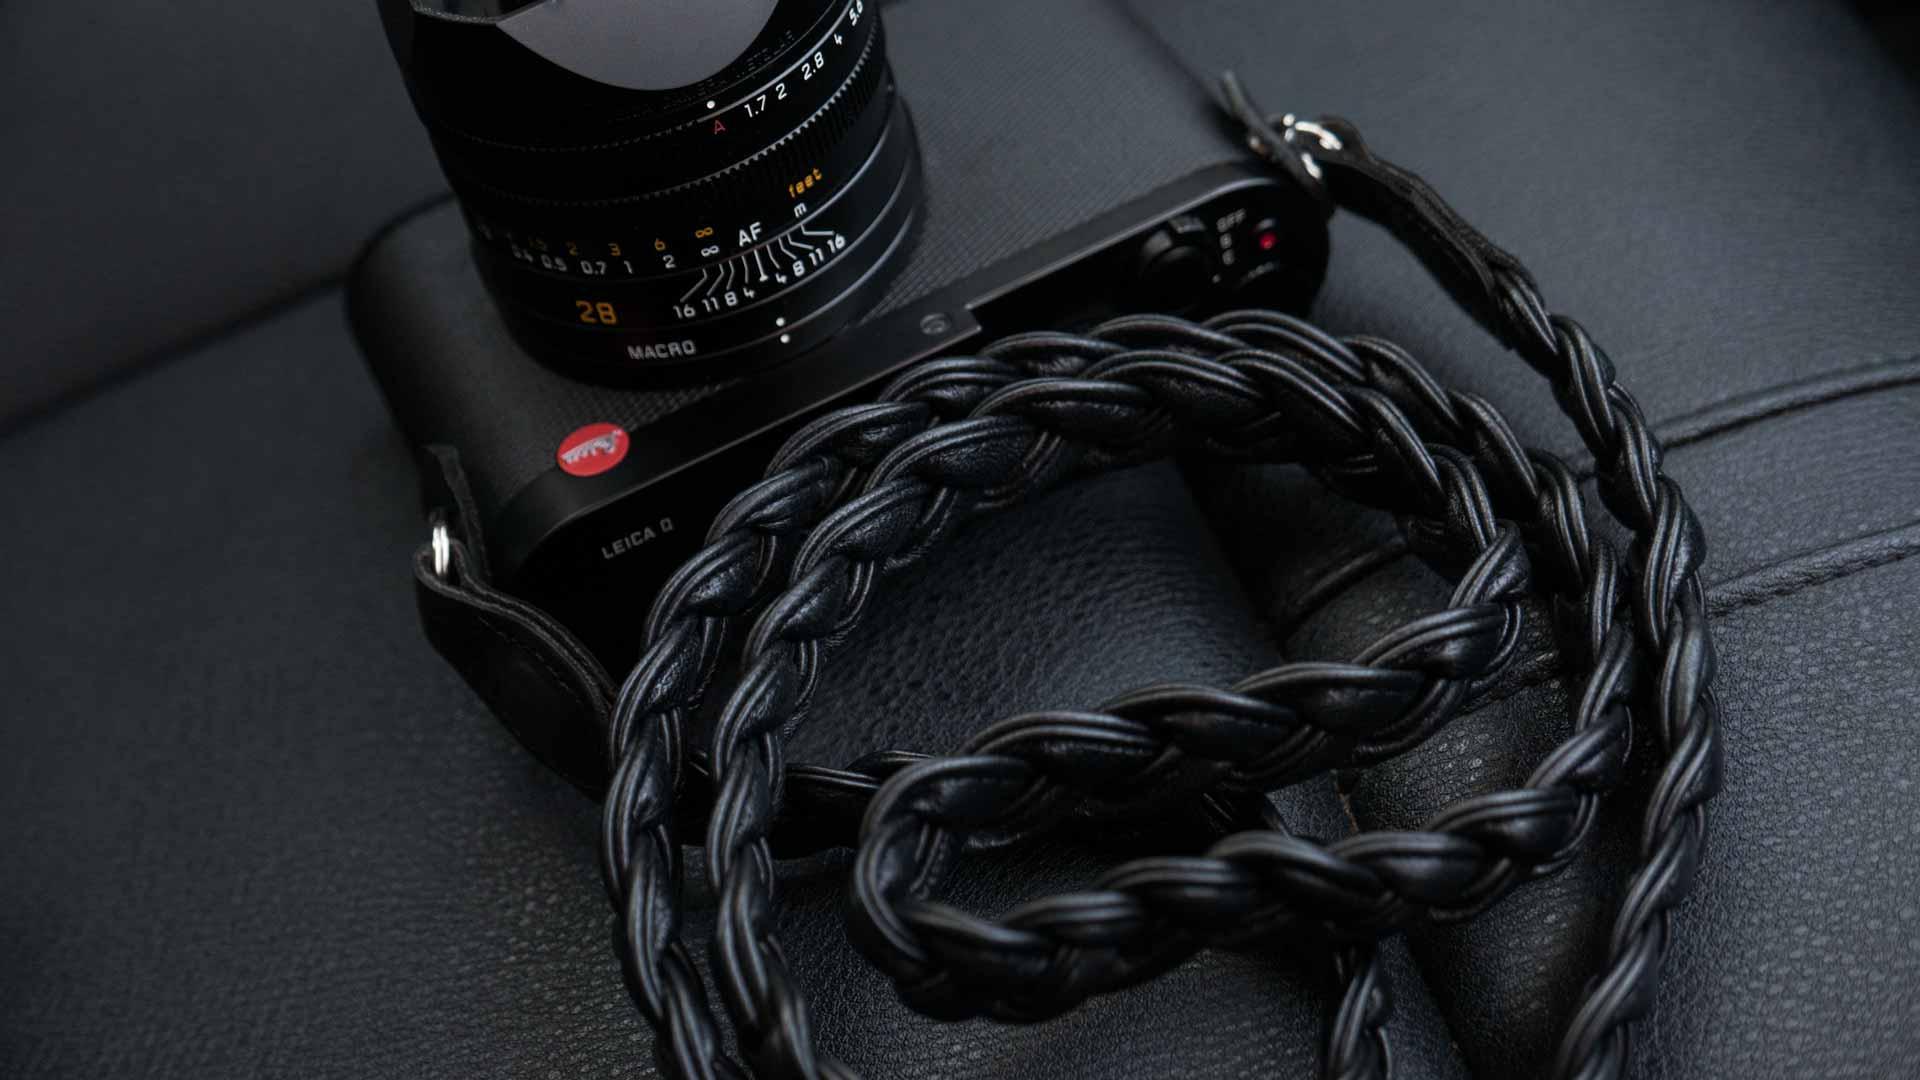 leica m strap, leather camera strap, handmade leather camera strap, leica camera strap, mirrorless camera strap, handmade camera strap, black camera strap, braided camera strap